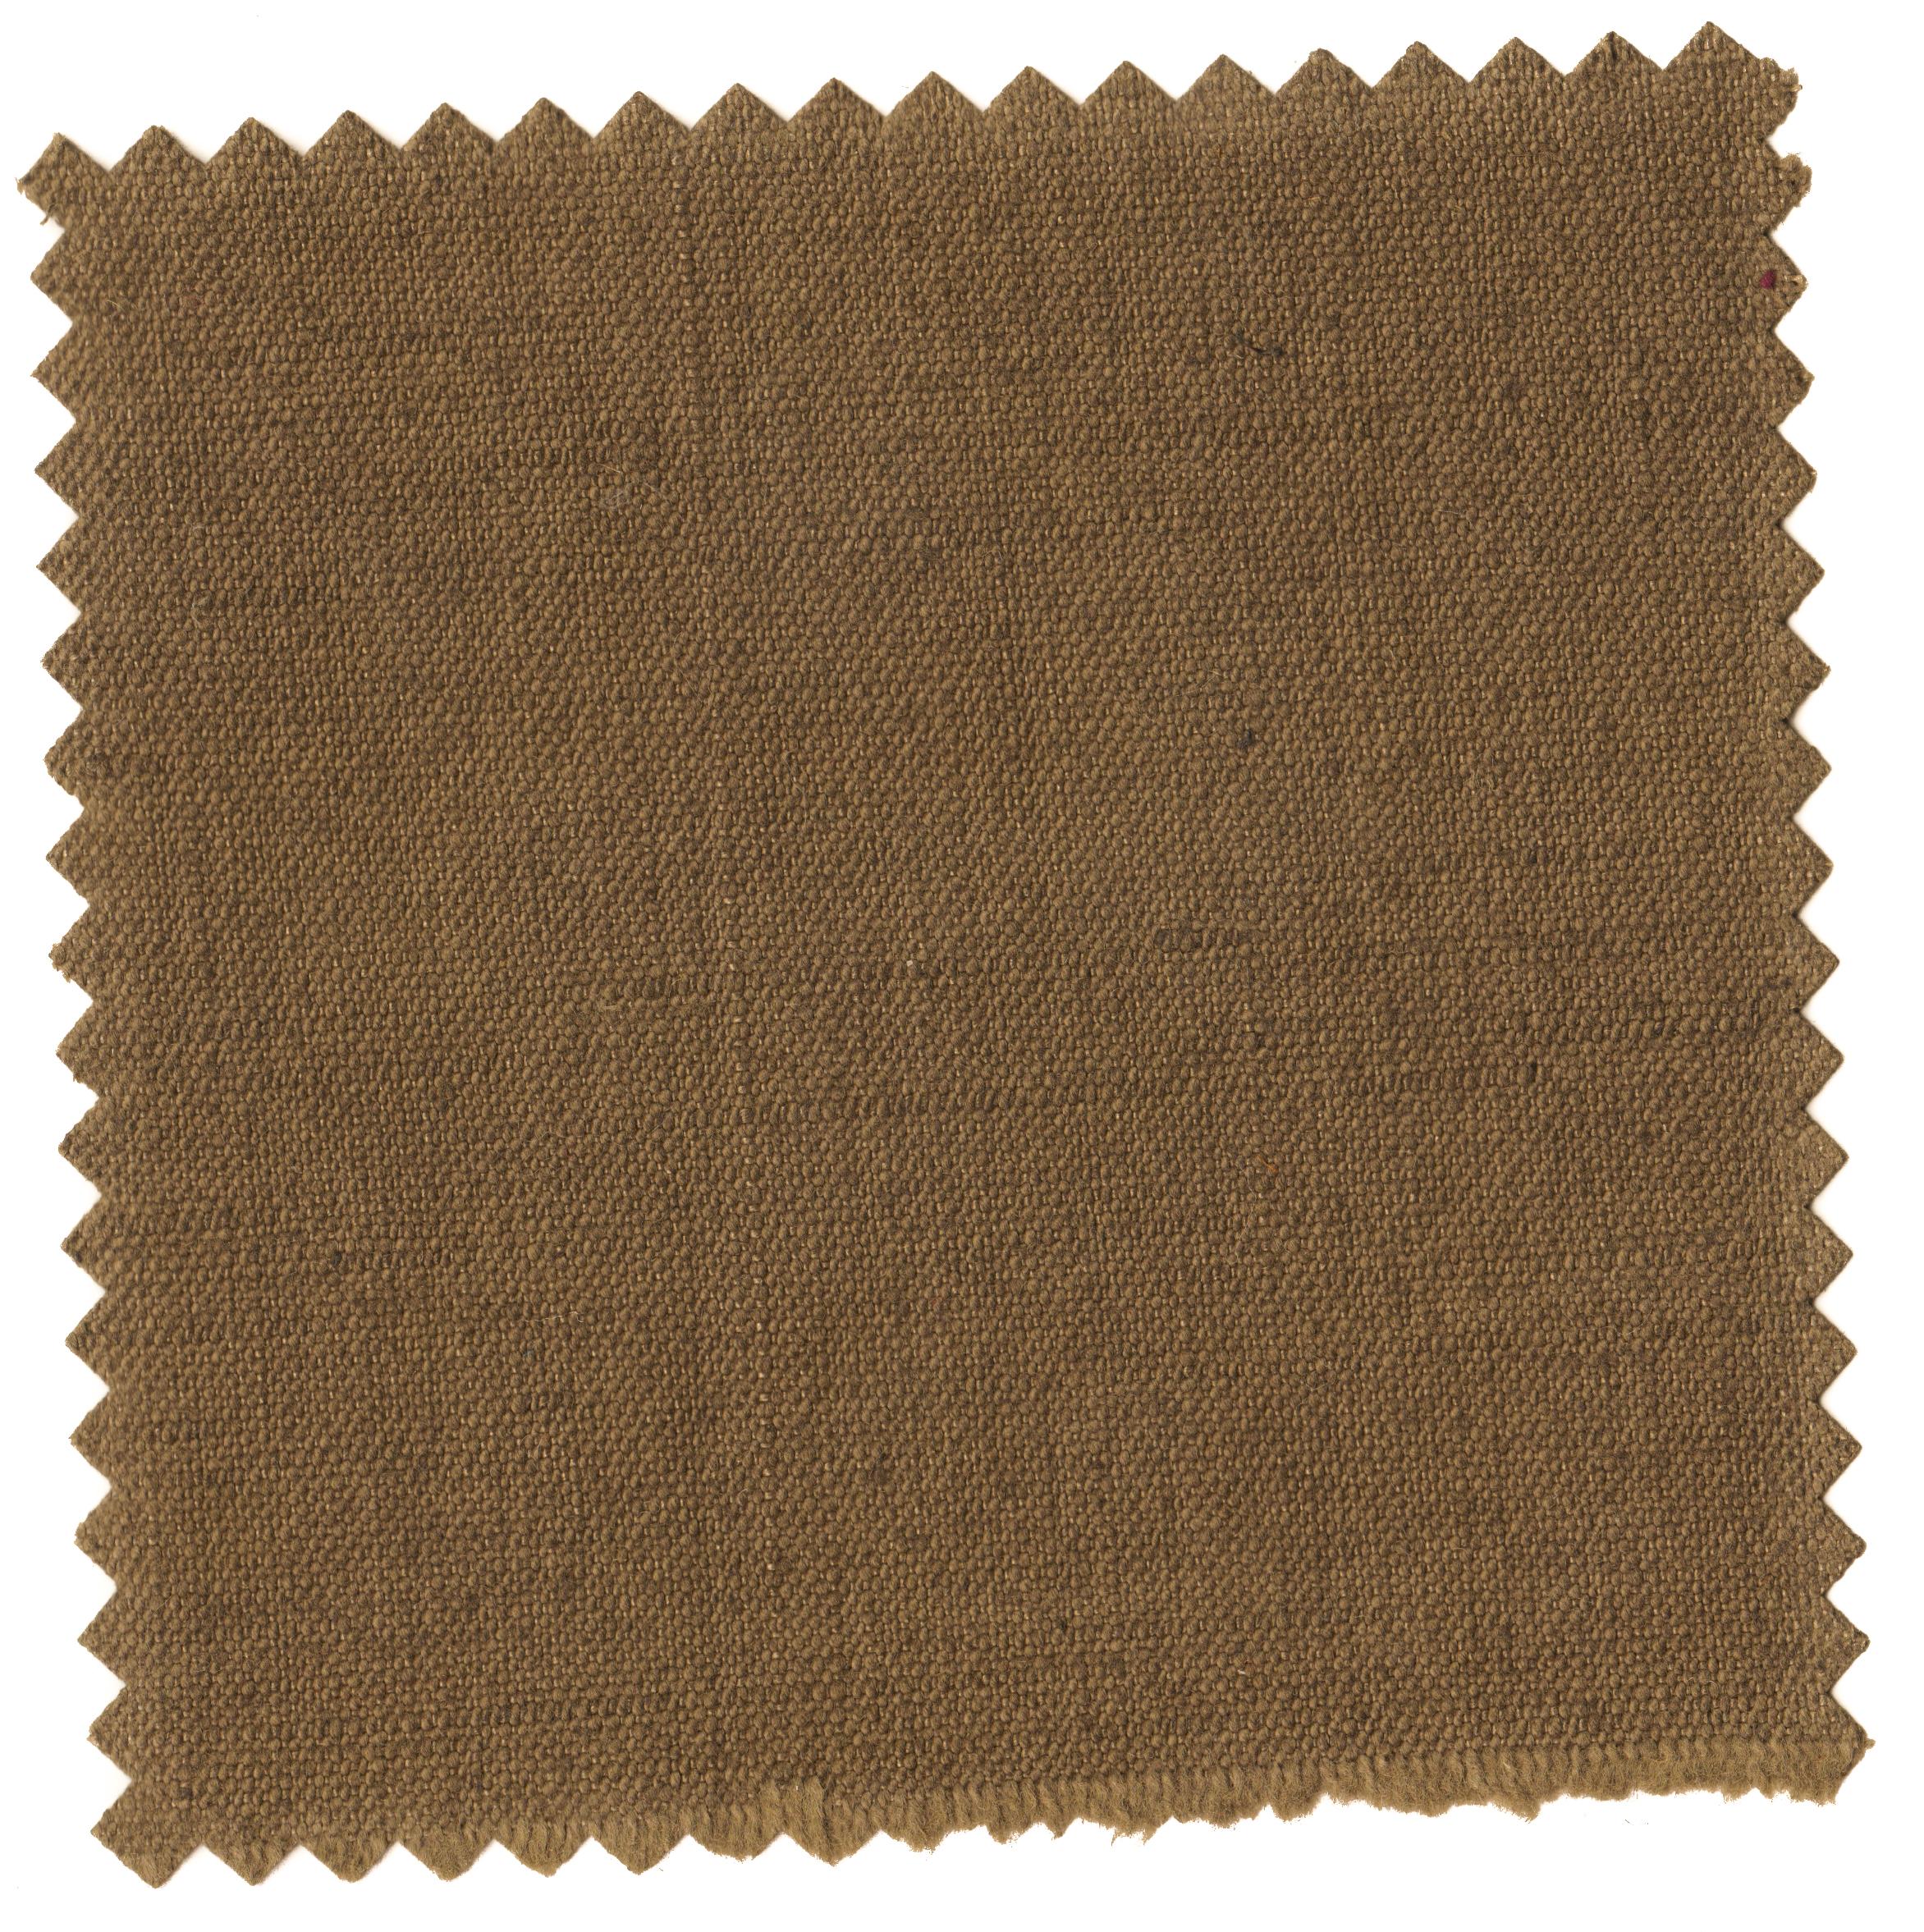 Walnut Browns-3.jpg